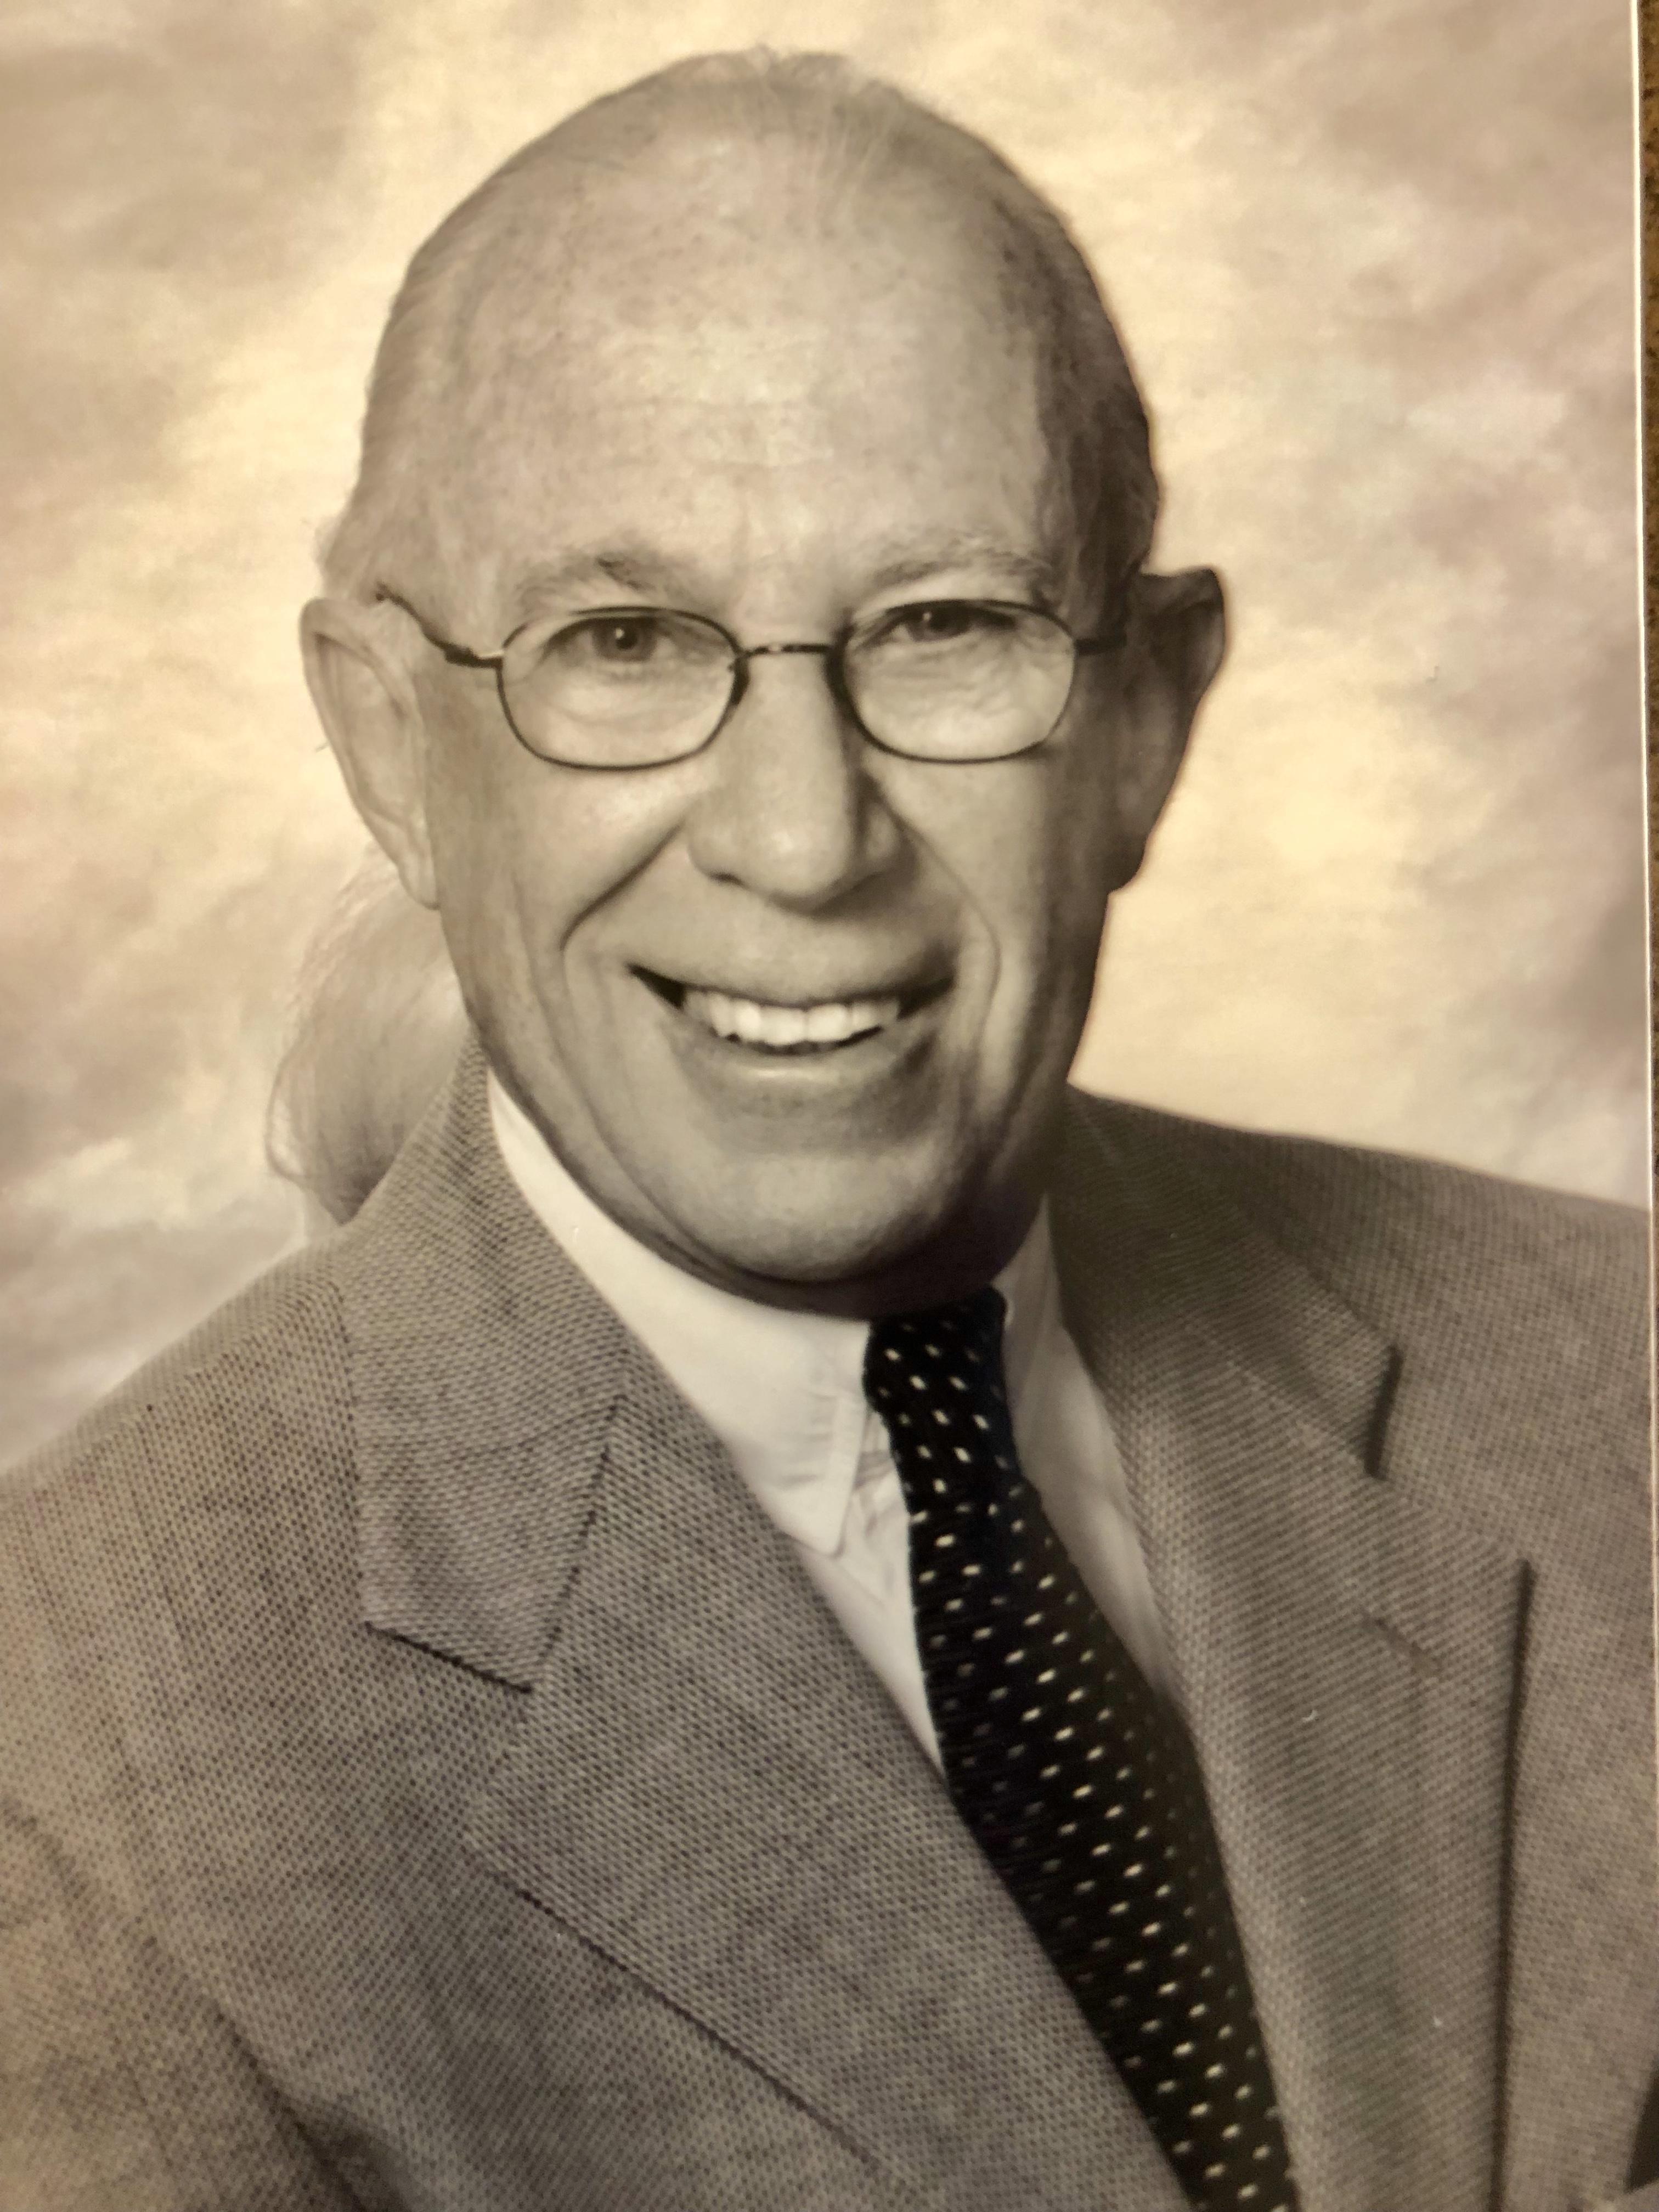 Honoring Jerry Hoberman